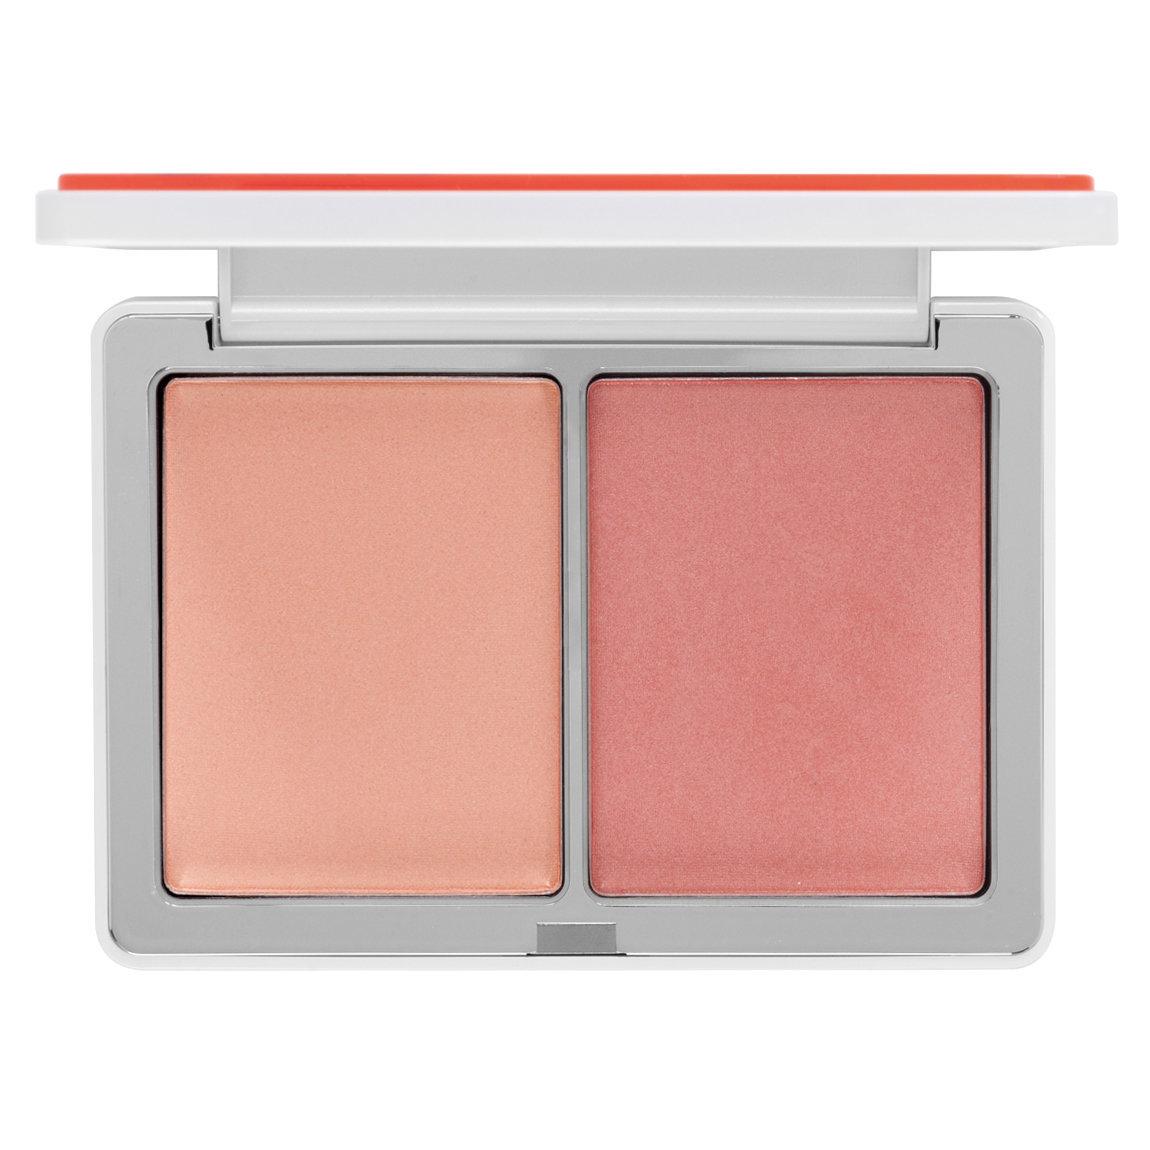 Natasha Denona Blush Duo 10 - Sheer Peachy Nude product swatch.